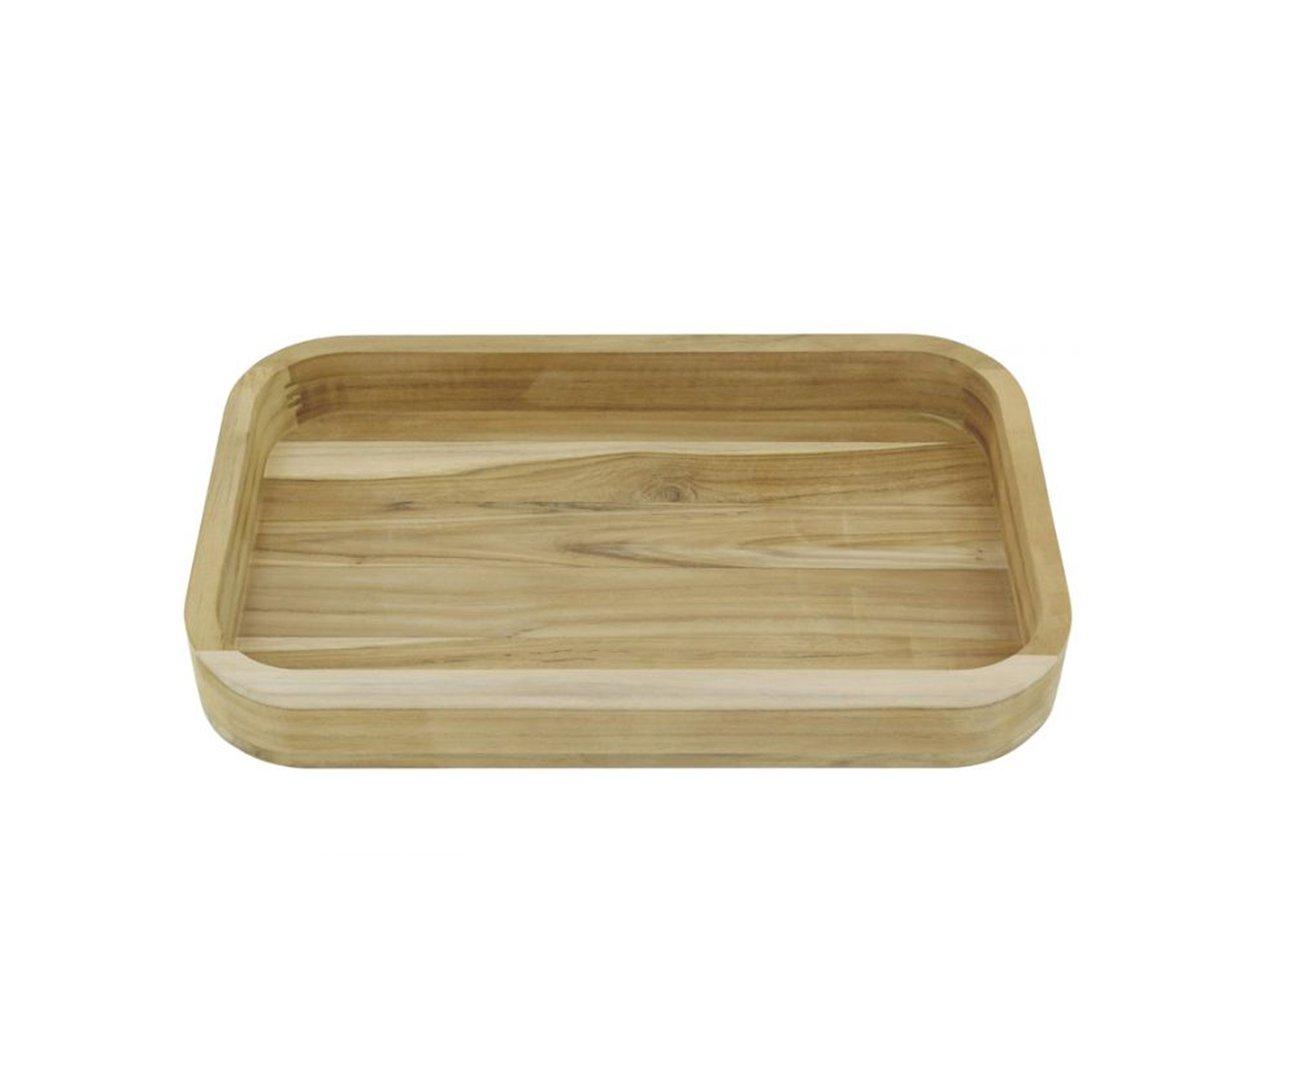 Gamela De Madeira Salada/churrasco Teca 450x300mm 13209052 - Tramontina